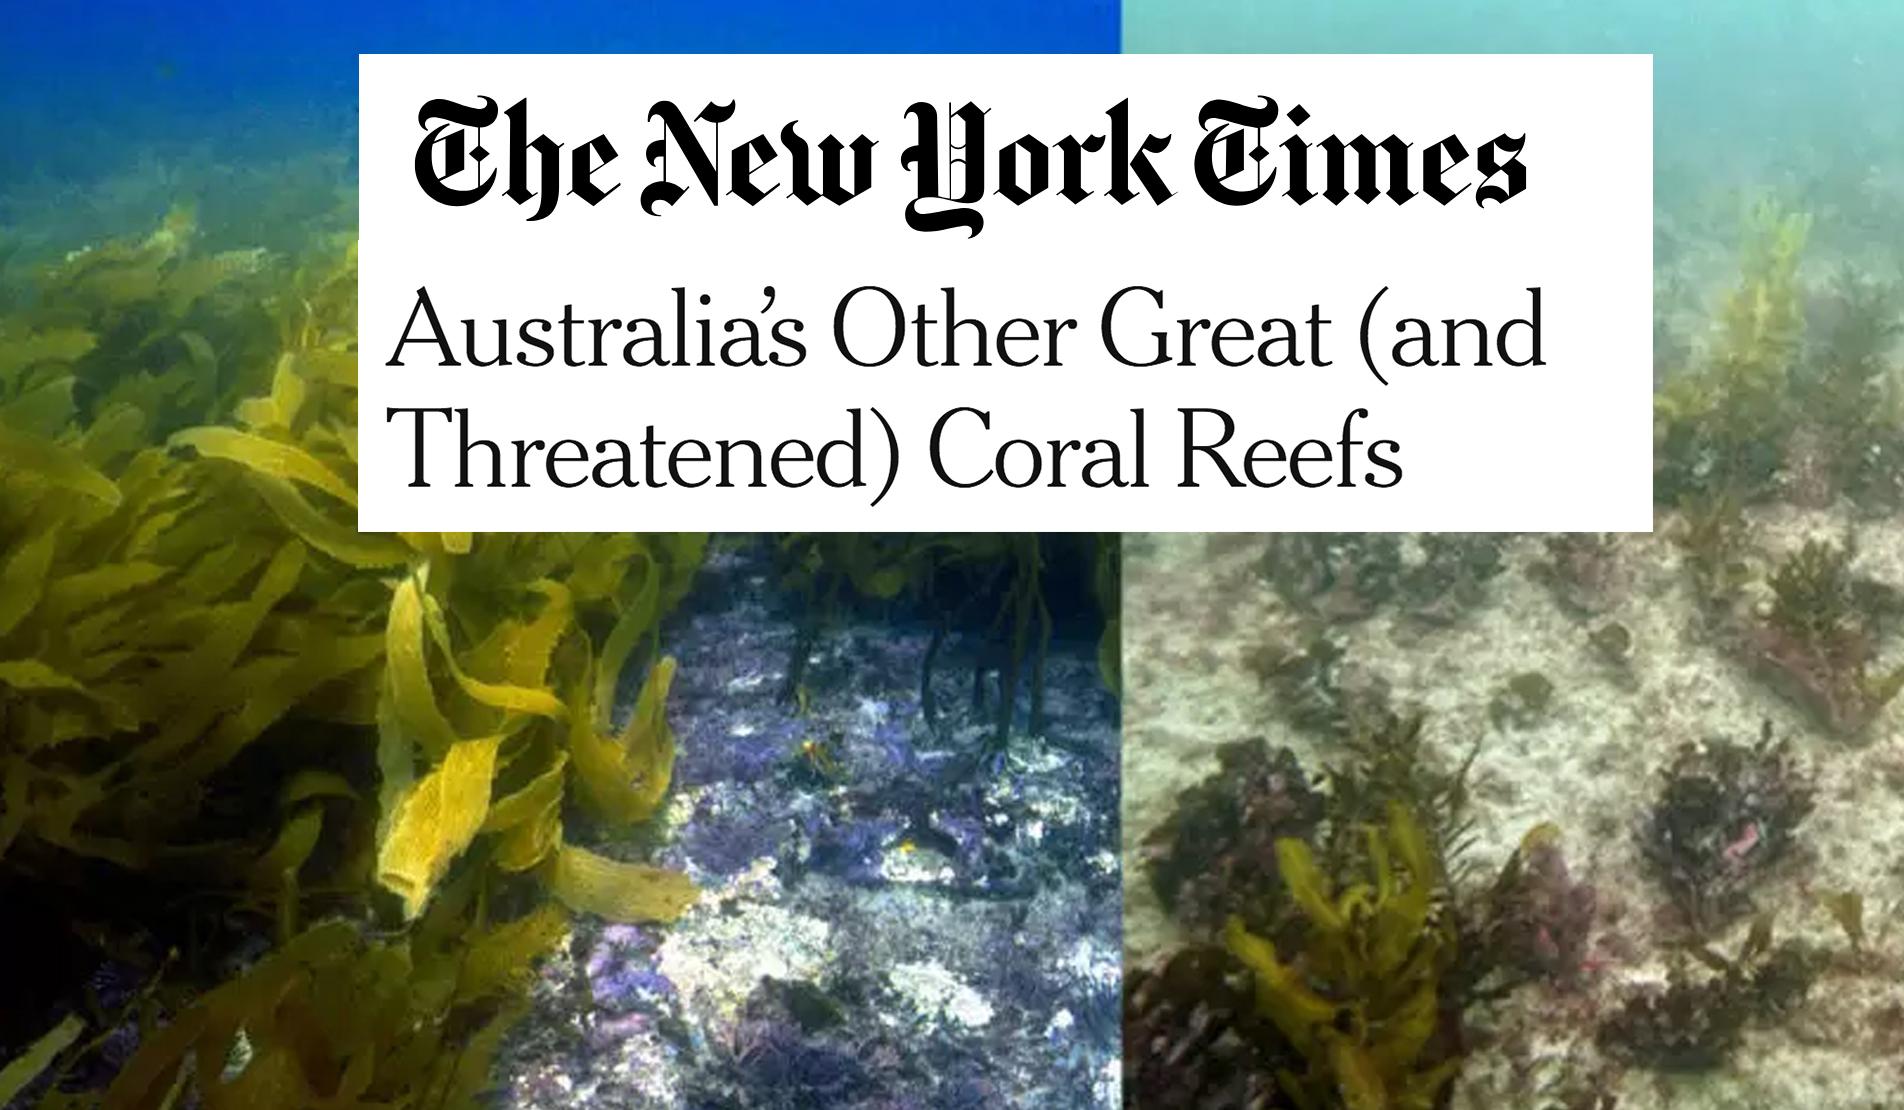 GSR 11 New York Times.jpg